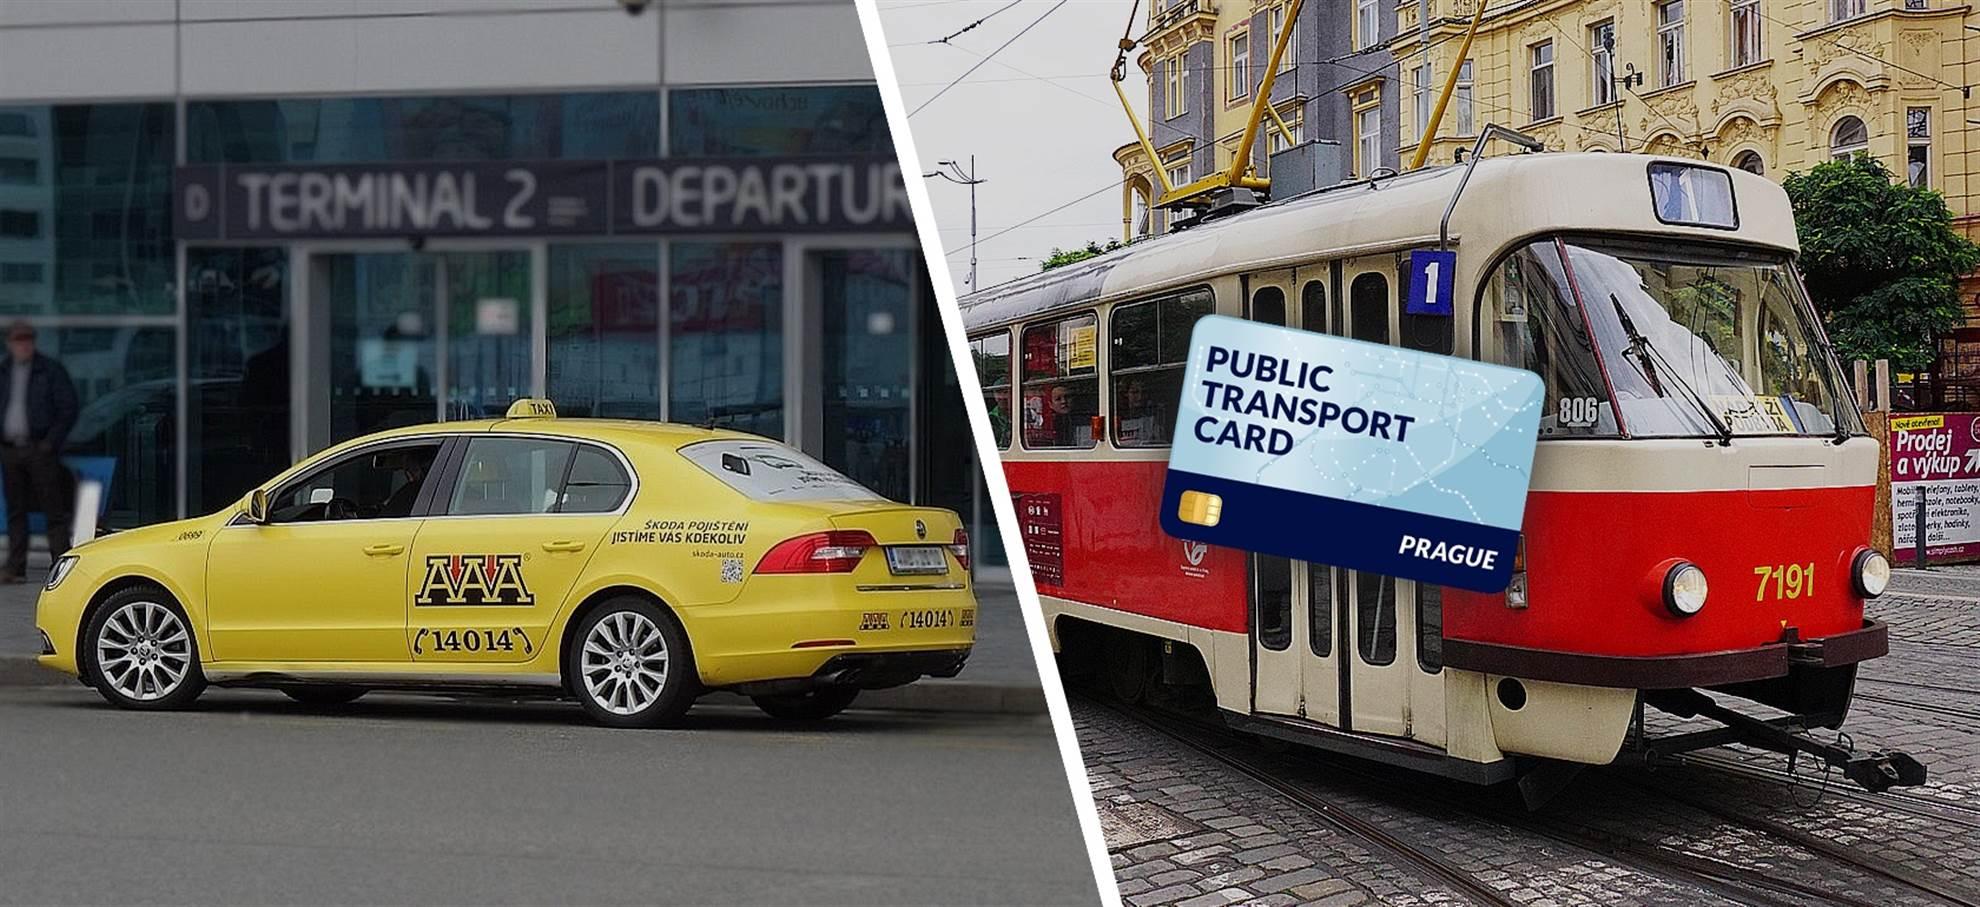 Praag Travel Card